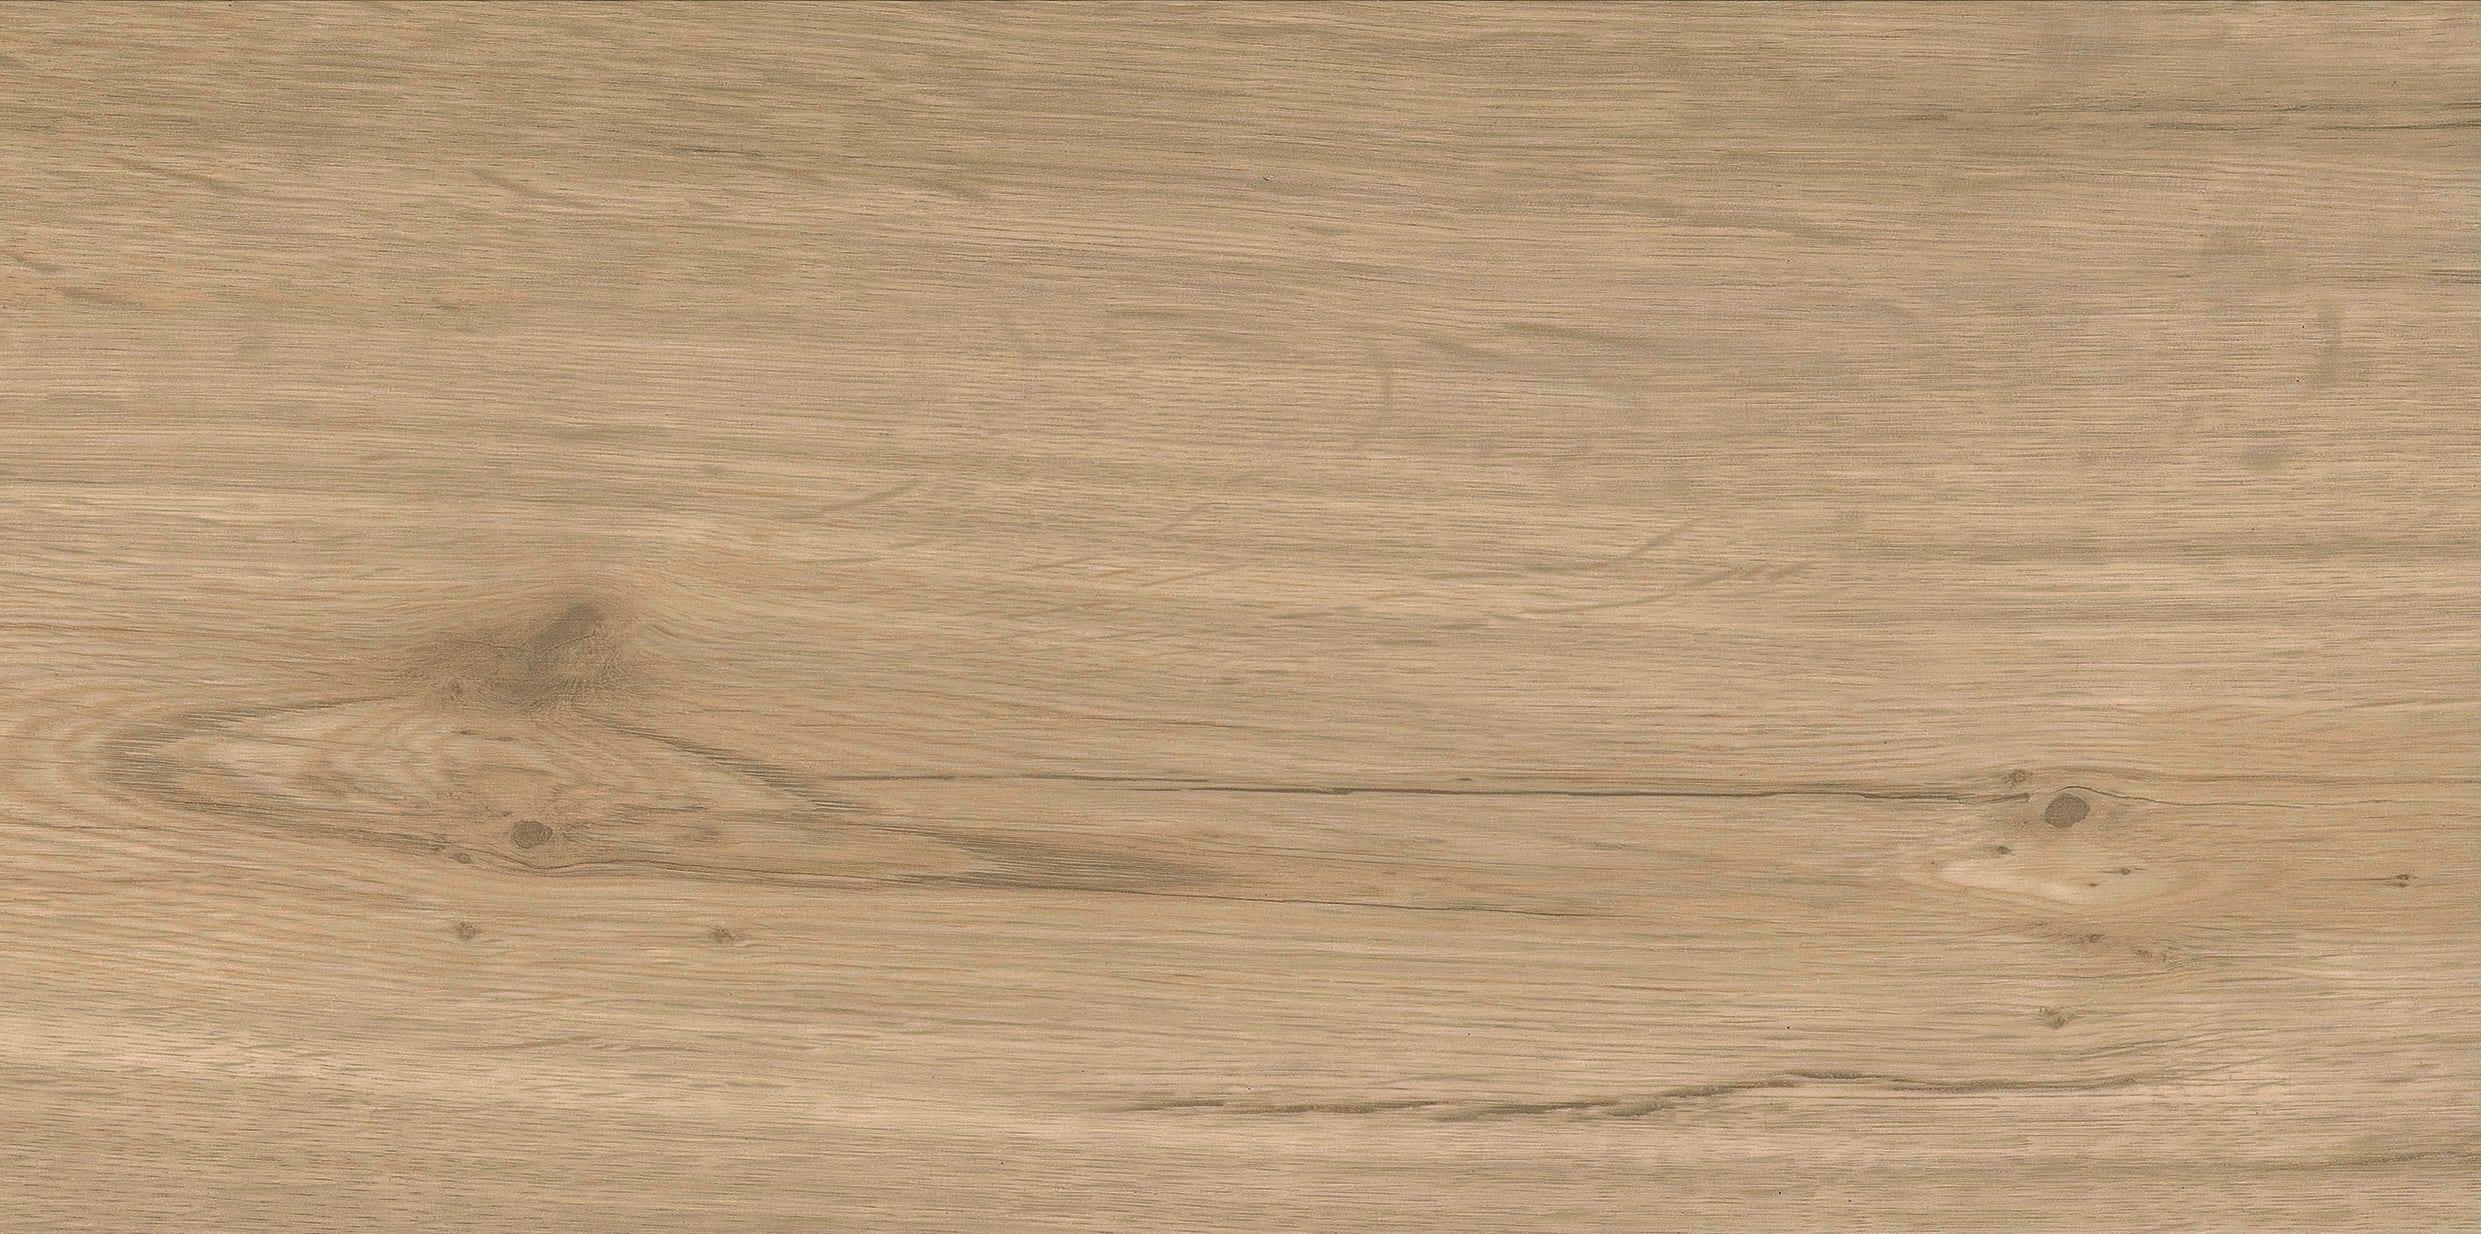 eiche sahara ziro vinyl hdf vinylboden holzoptik eiche sahara ziro vinyl hdf. Black Bedroom Furniture Sets. Home Design Ideas